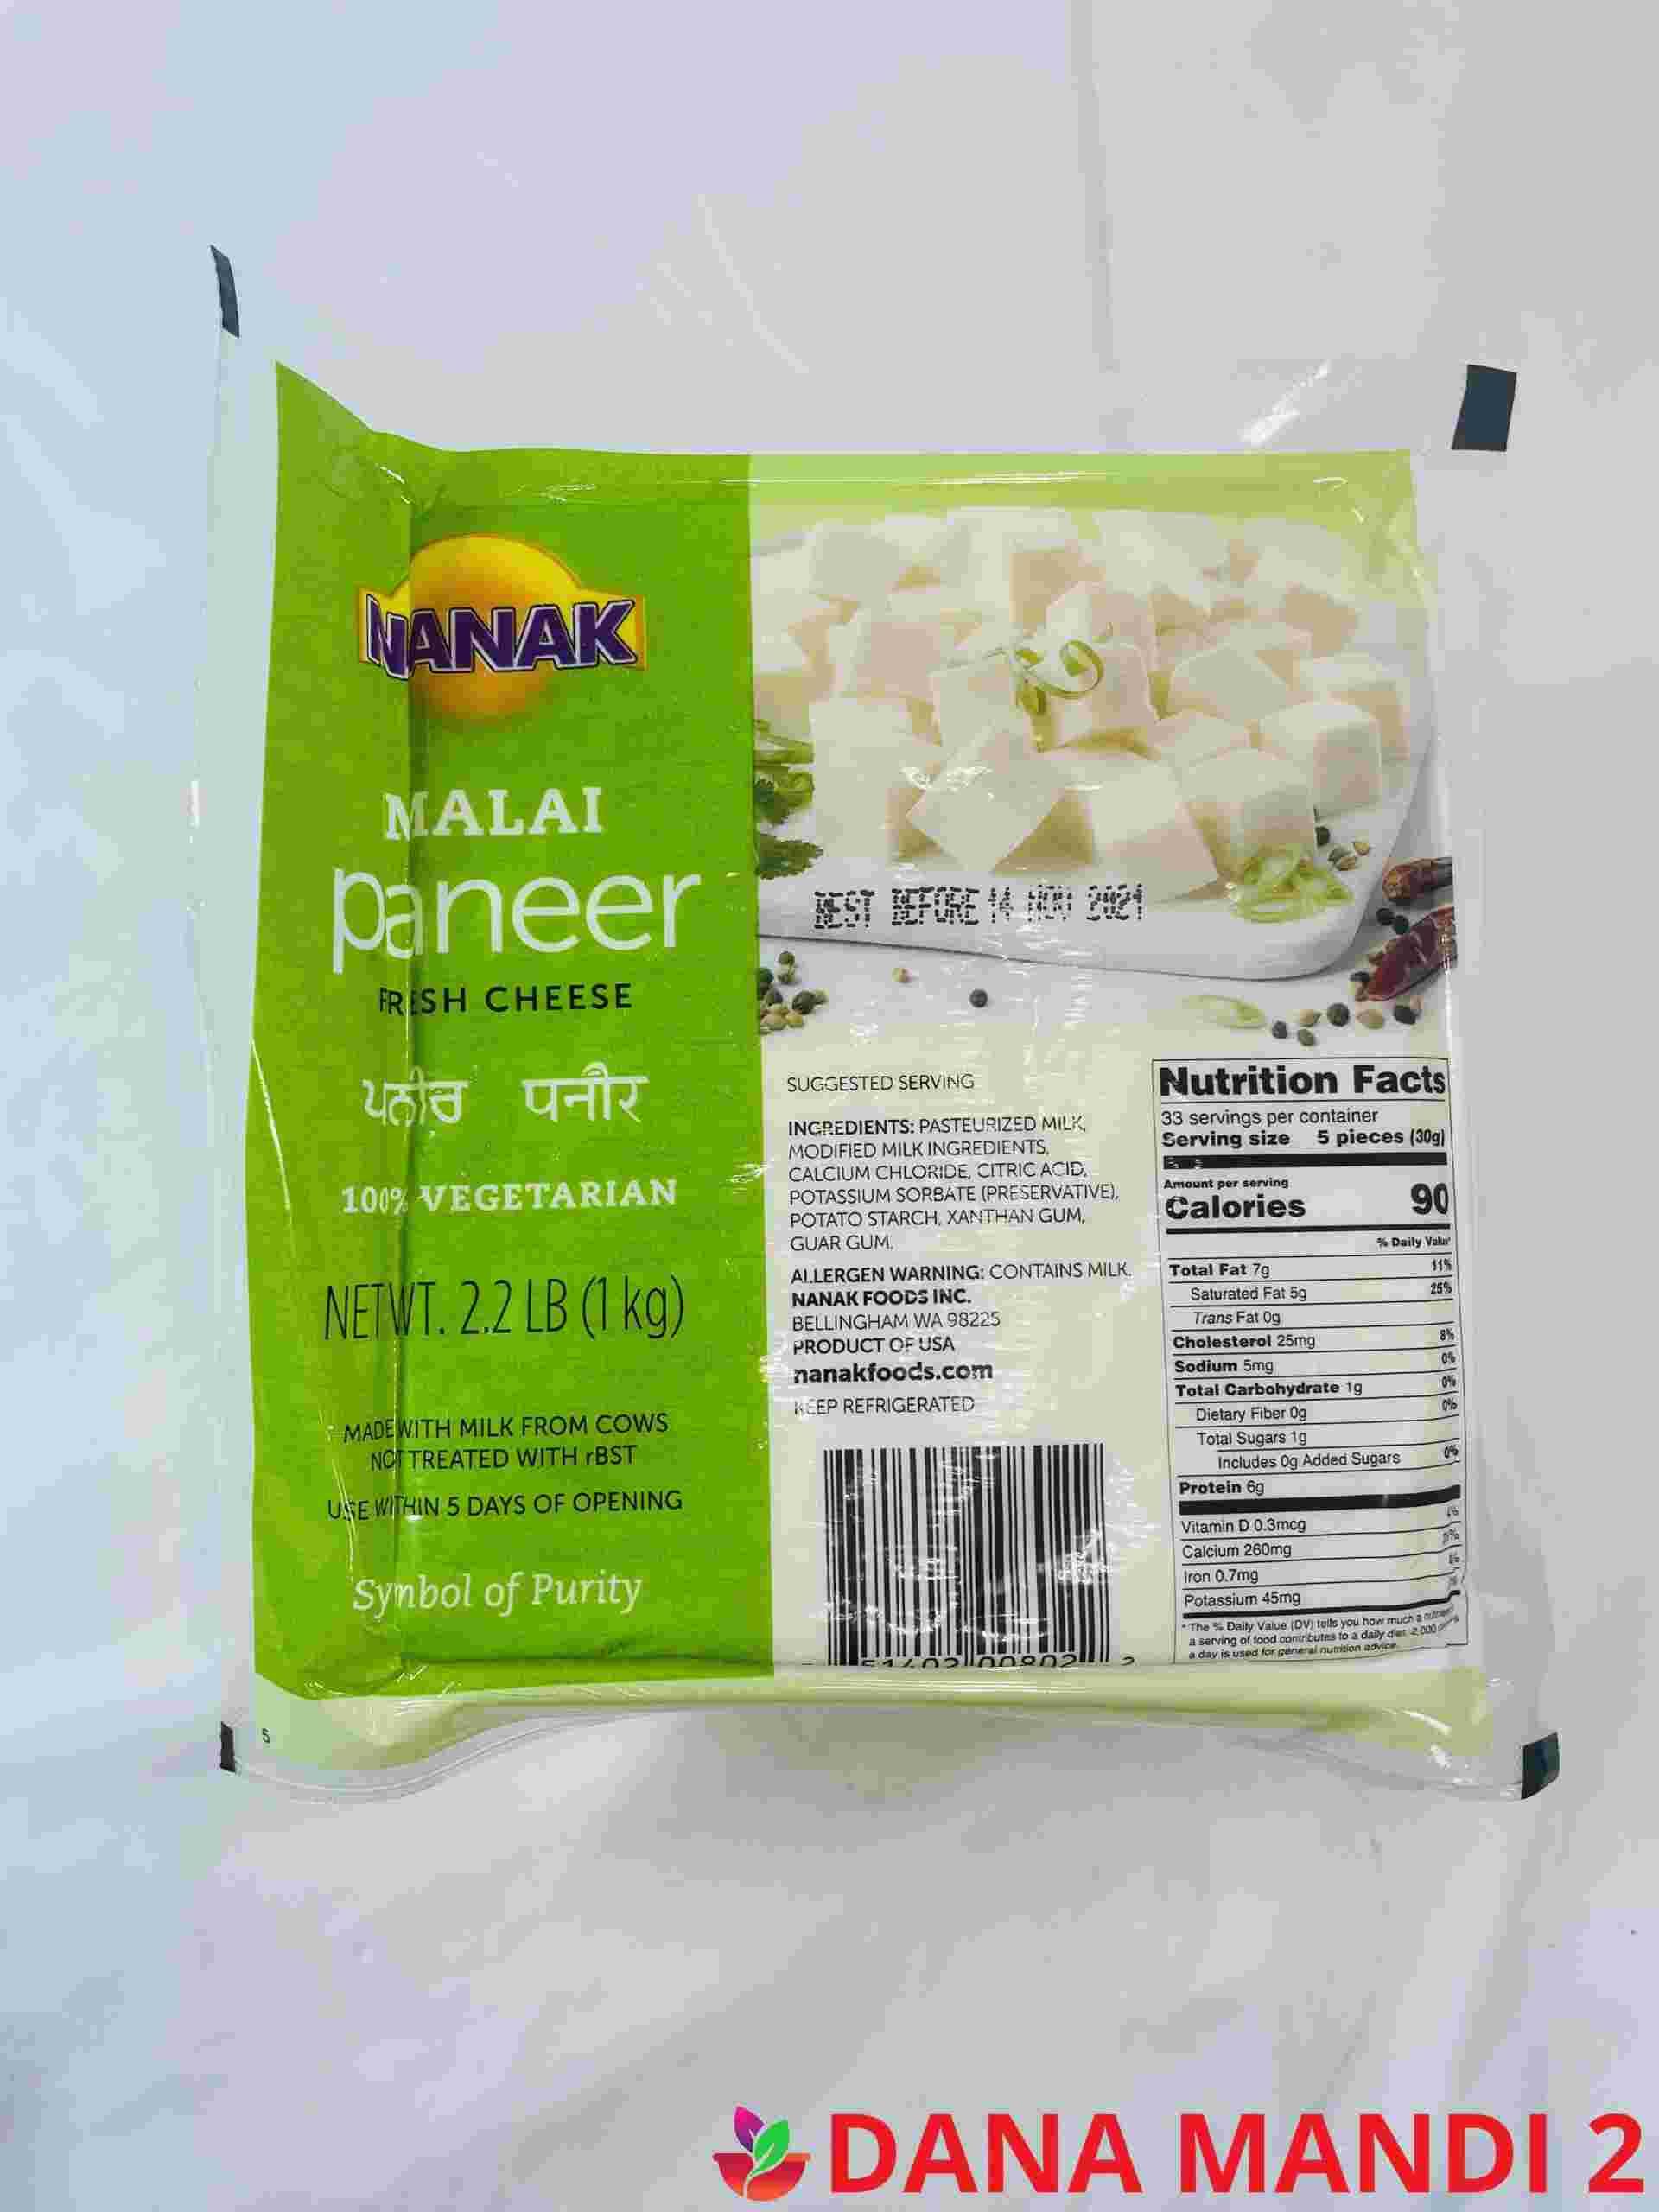 Nanak Mali Paneer (Big Size )